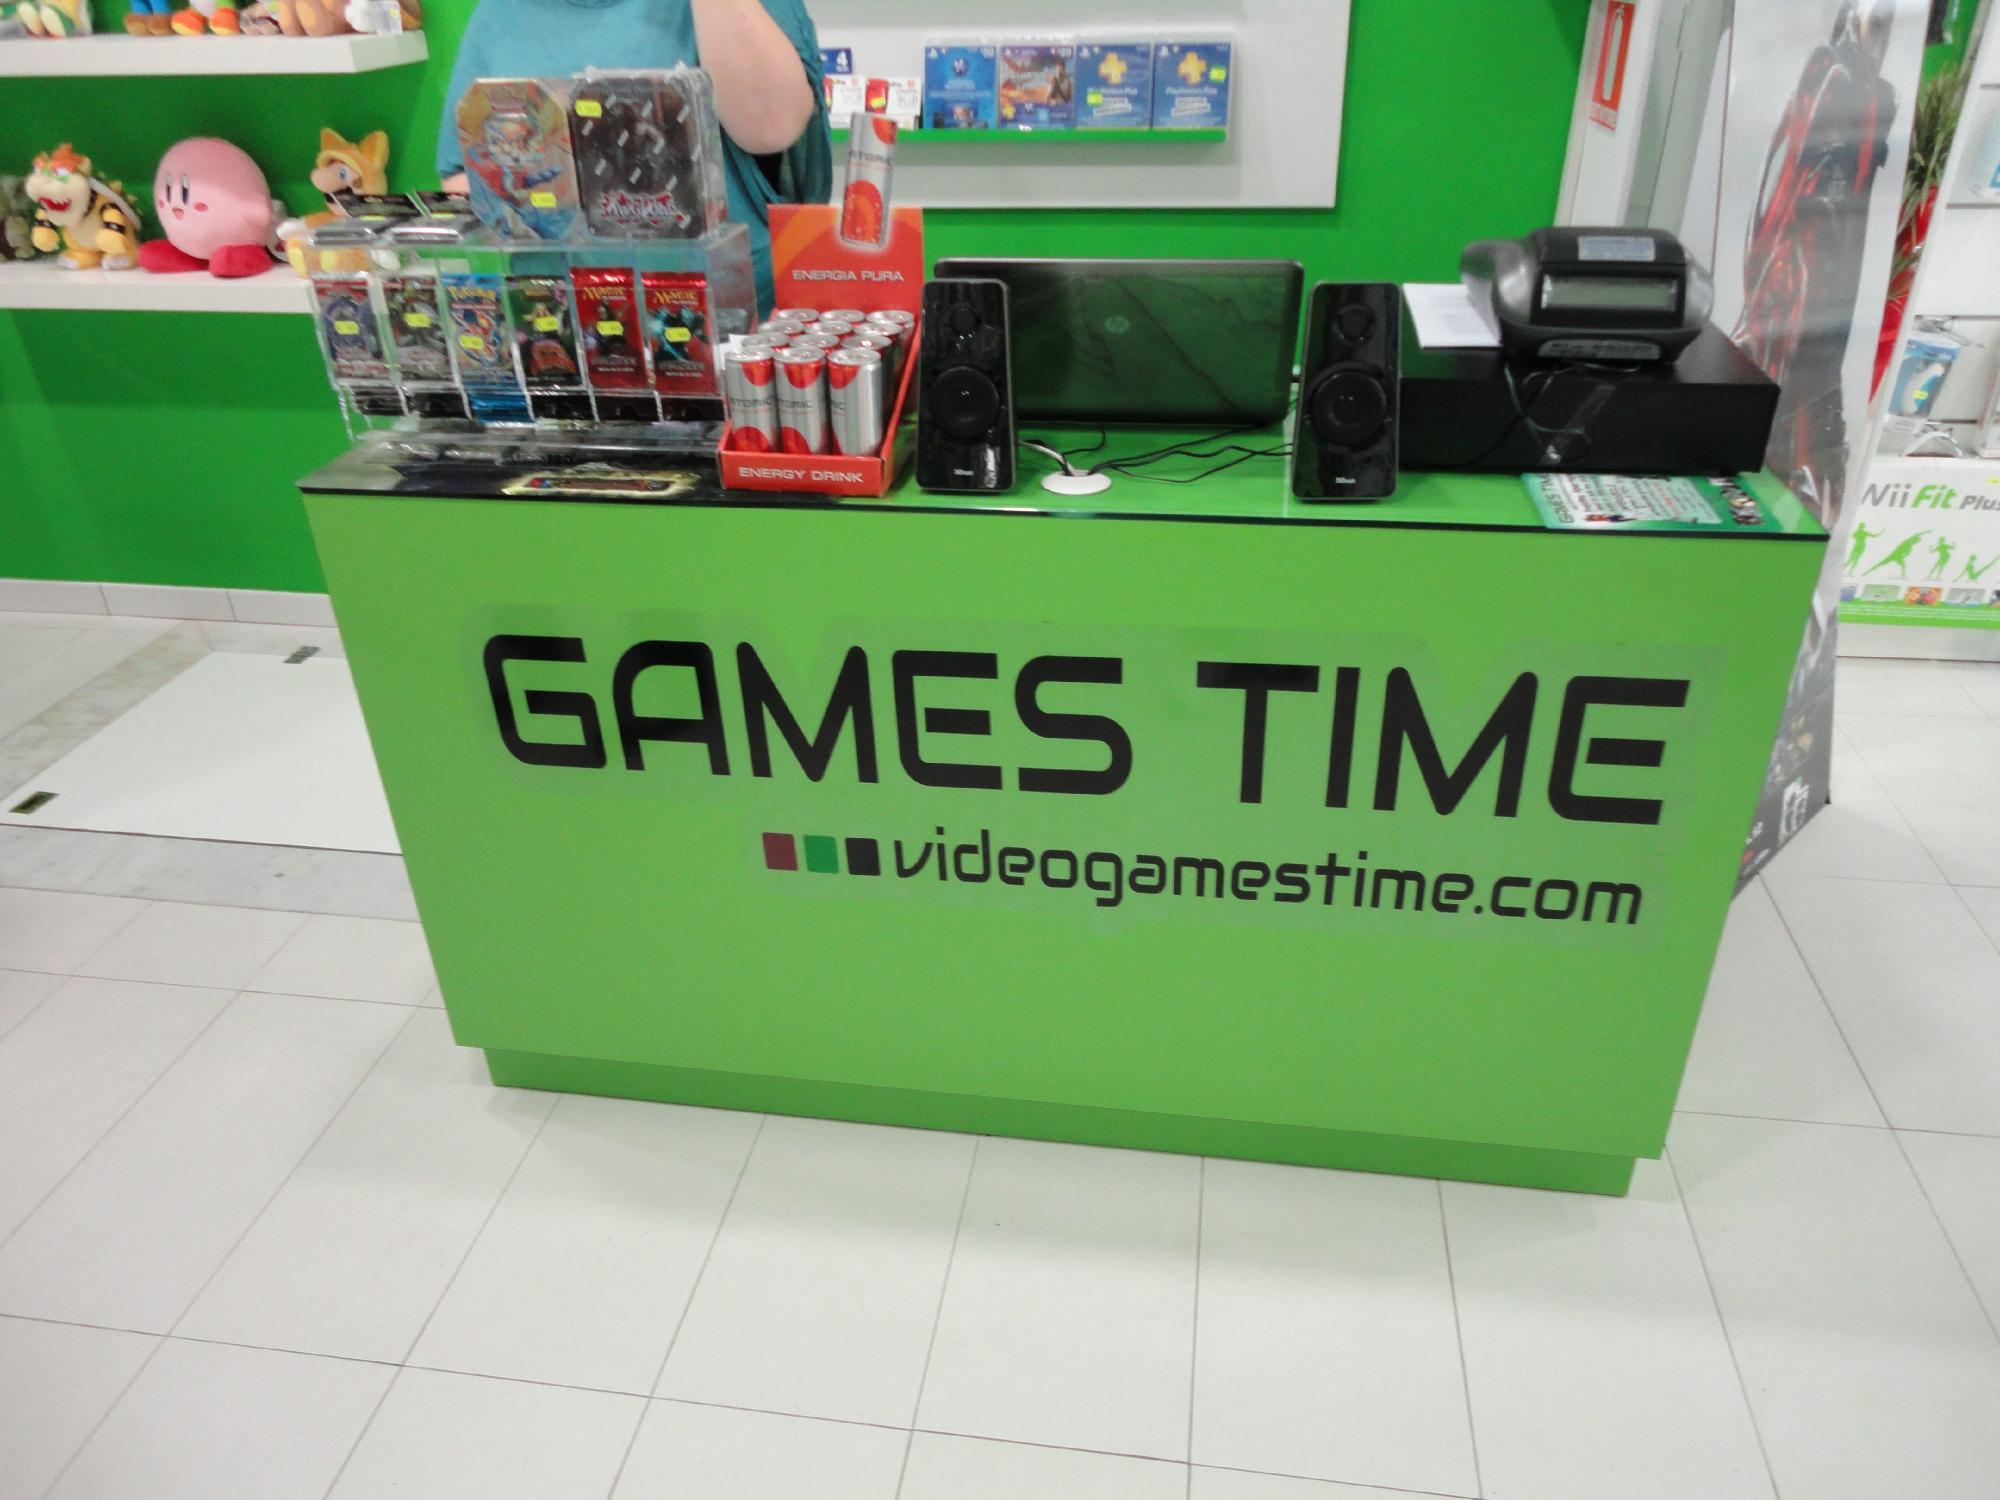 GamesTime